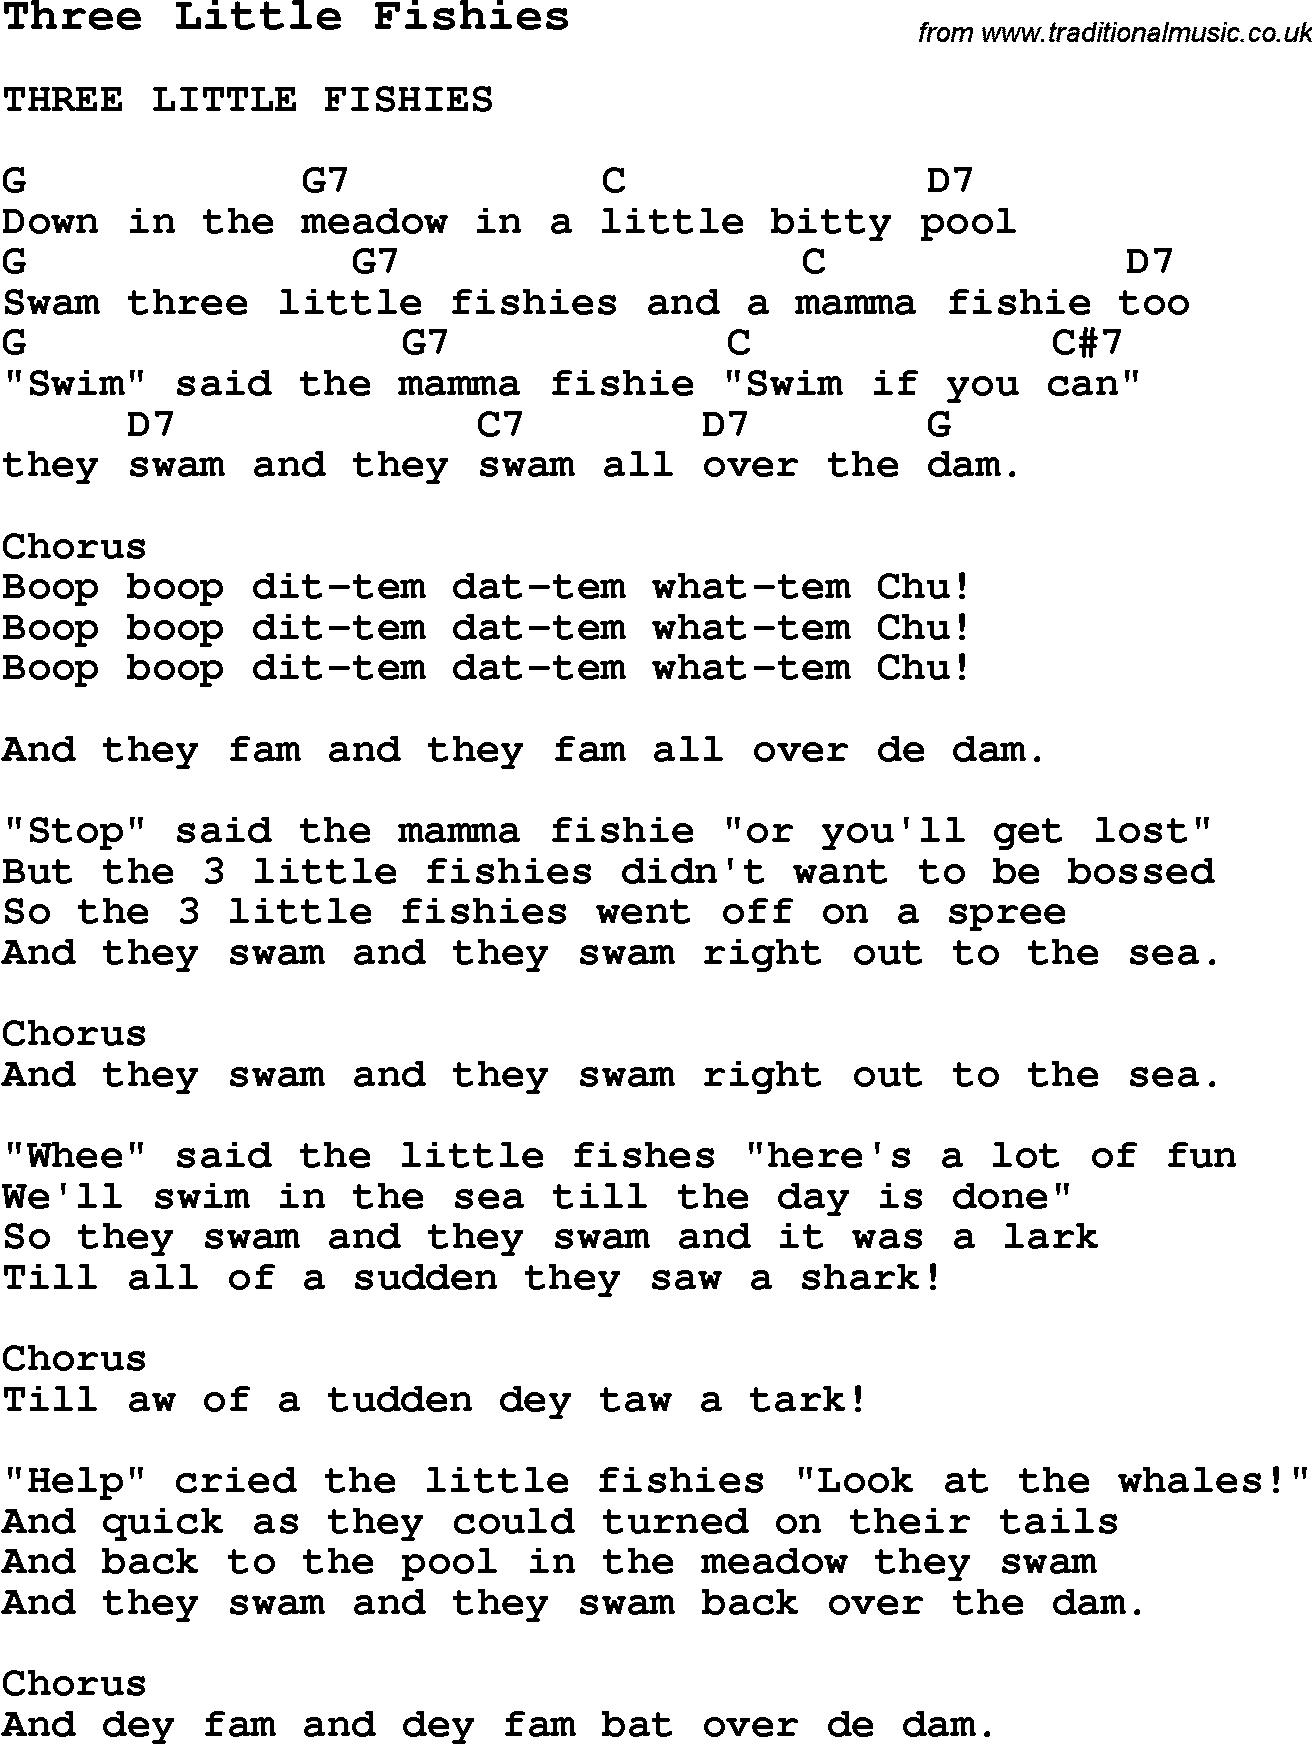 Summer Camp Song Three Little Fishies With Lyrics And Chords For Ukulele Guitar Banjo Etc